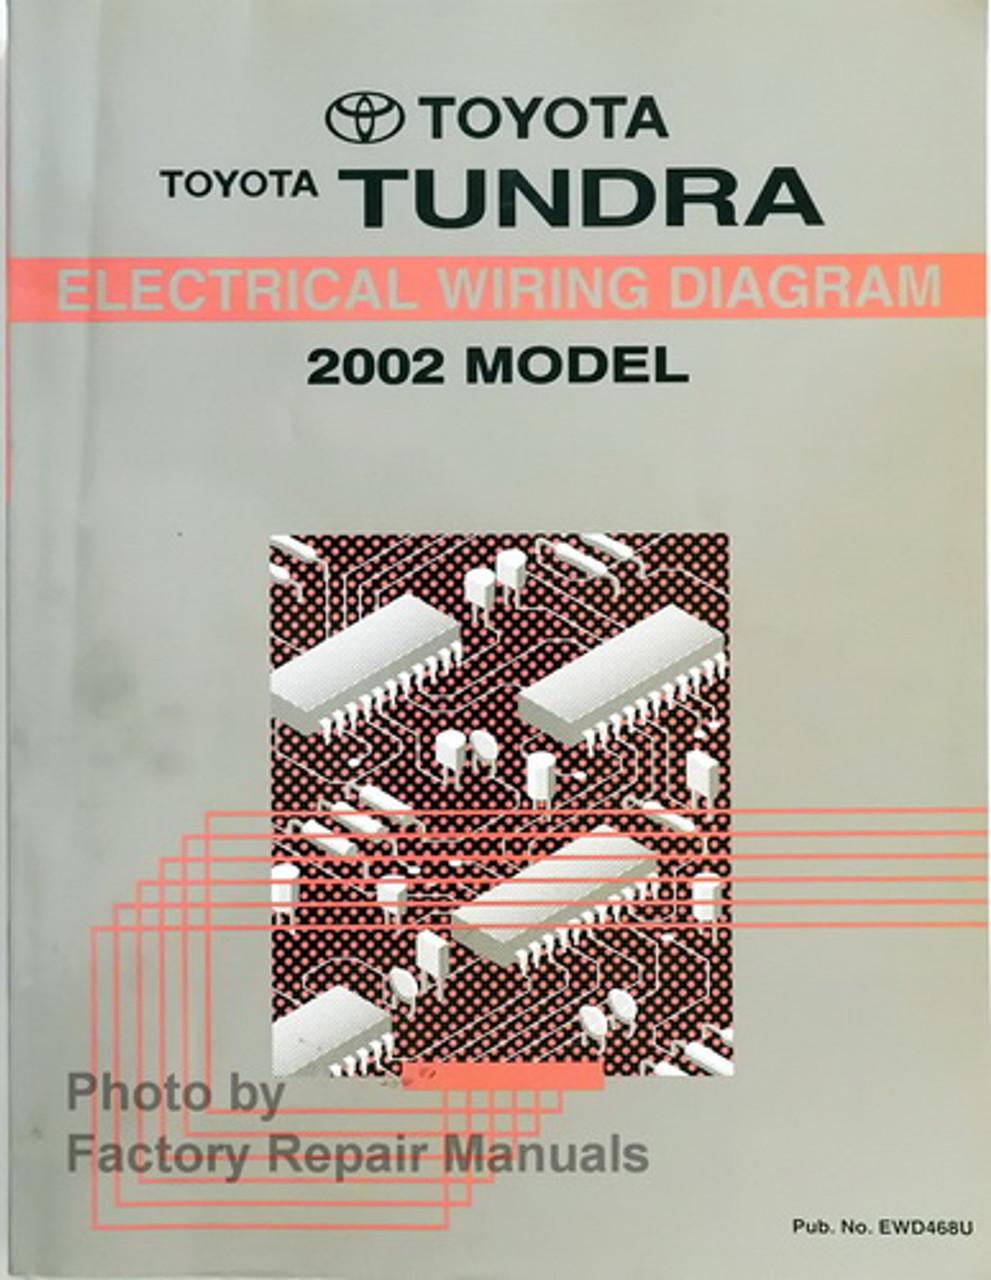 2002 Toyota Tundra Electrical Wiring Diagrams Original Factory Manual Factory Repair Manuals